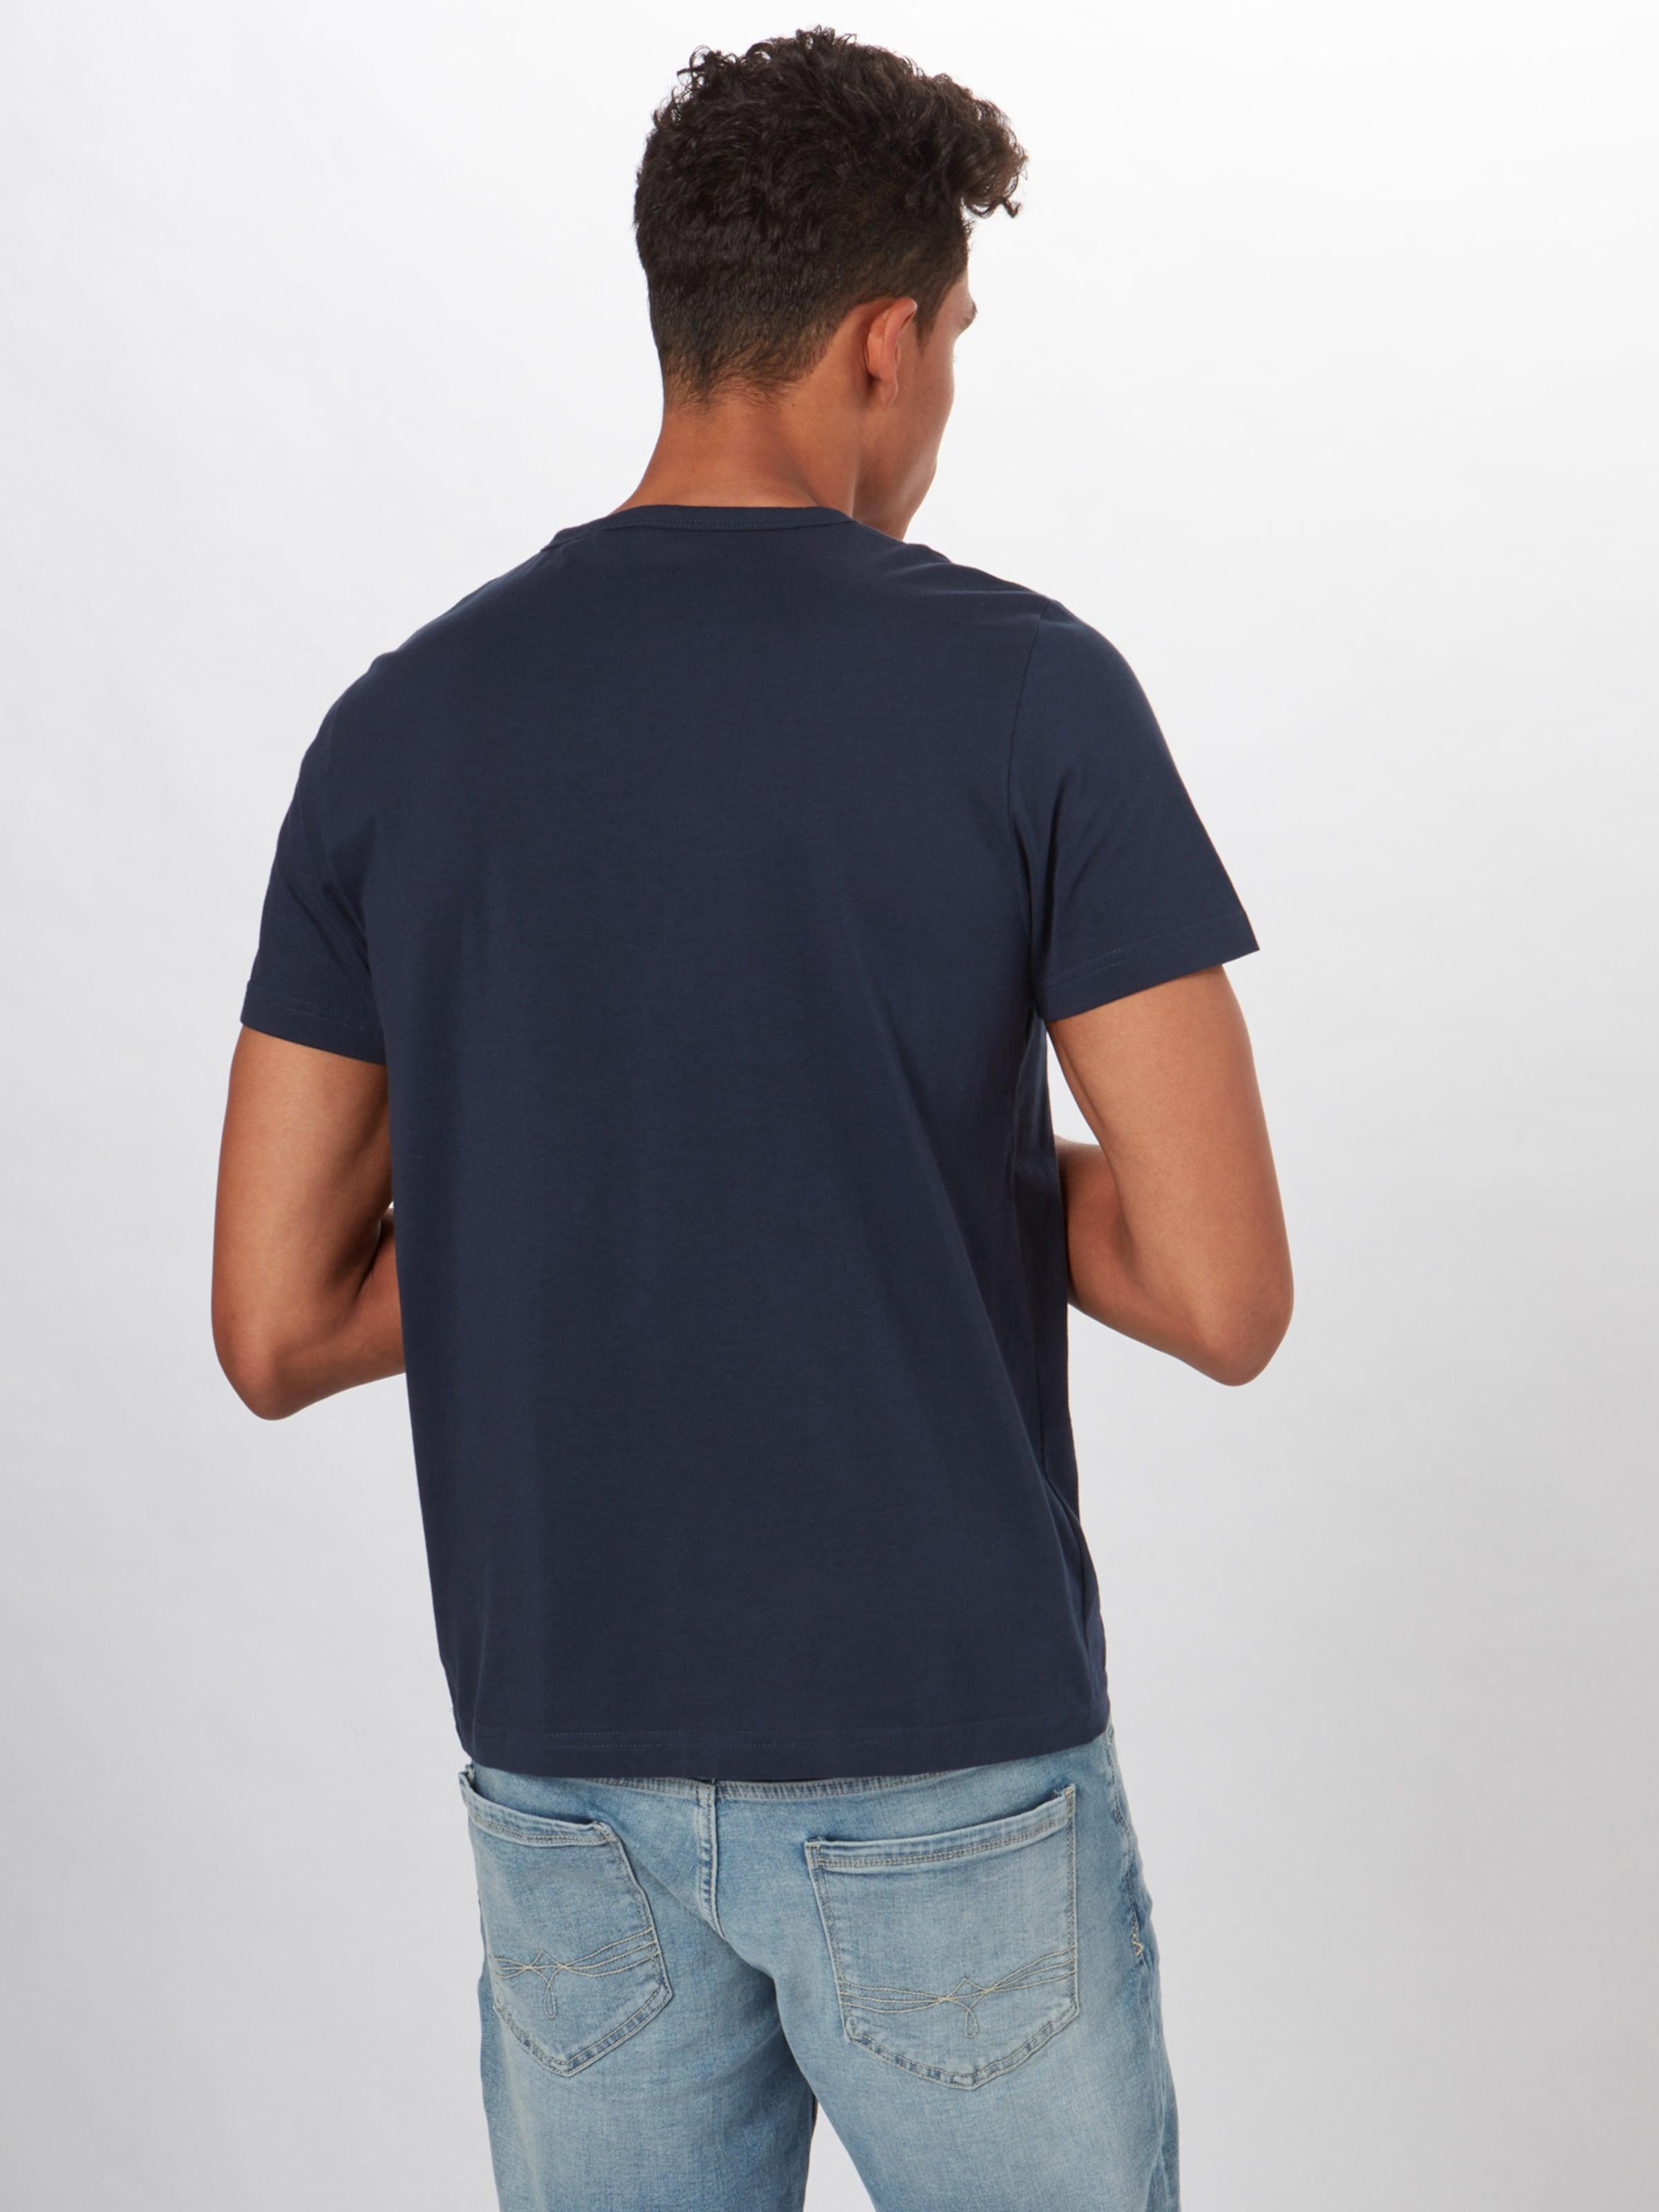 Label shirt En Red T oliver Bleu S Foncé 4L35jARq